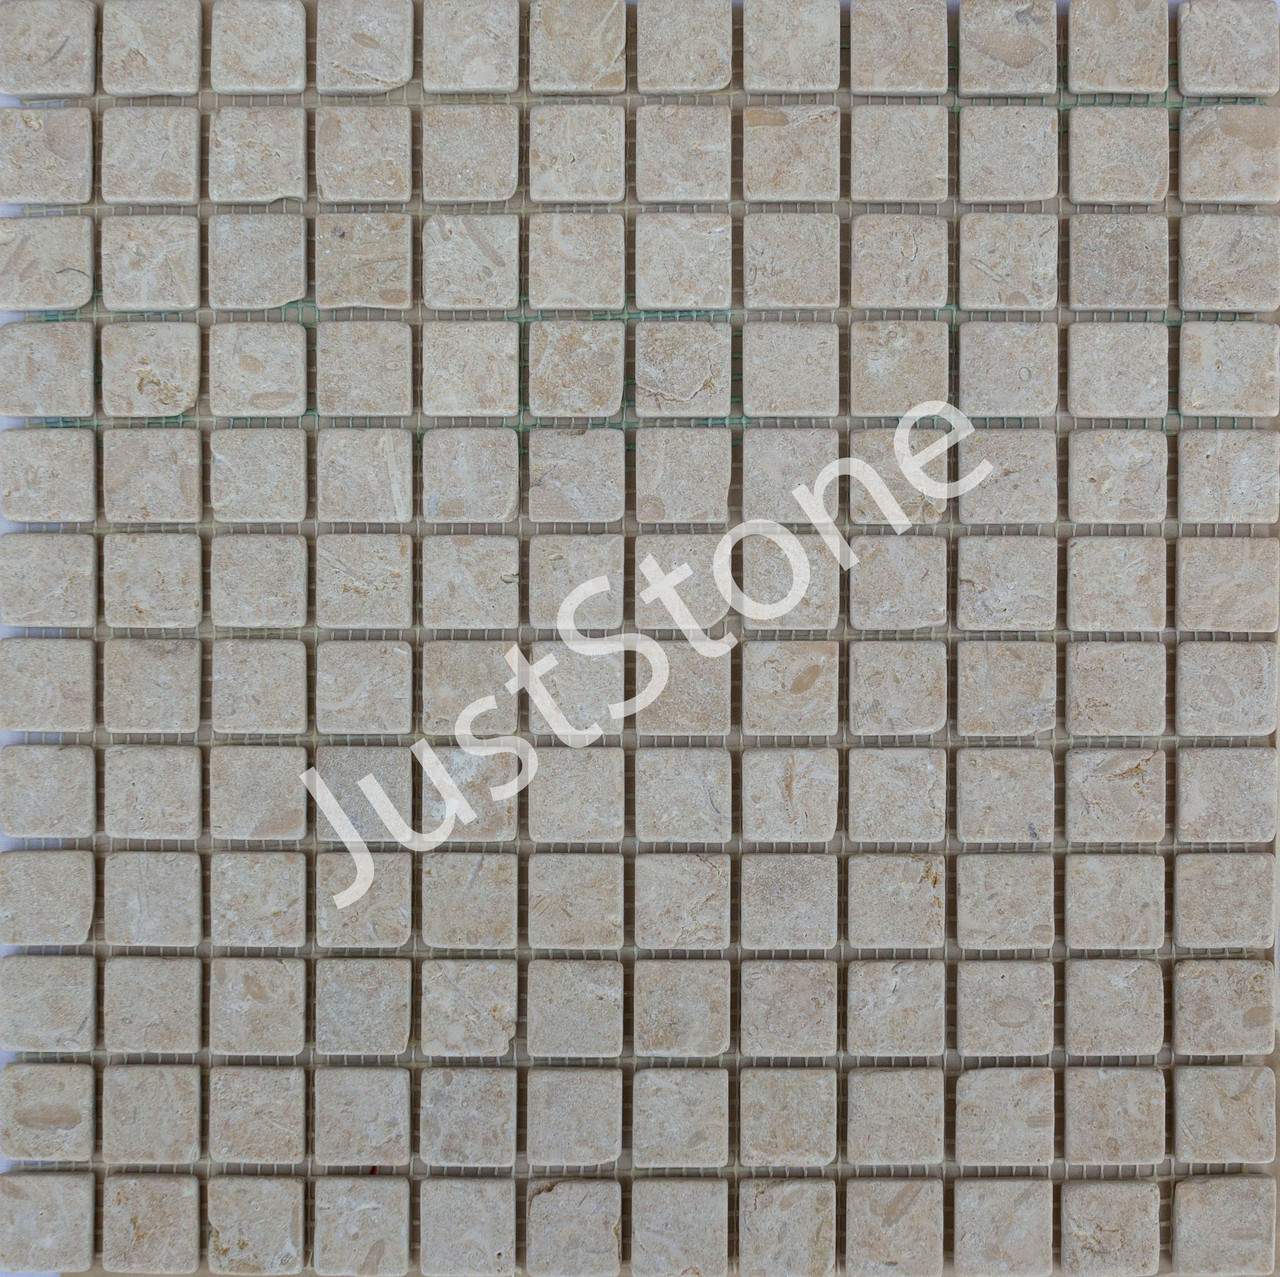 Мраморная Мозаика Стар.Валт. МКР-2СВ (23x23) 6 мм Beige Mix